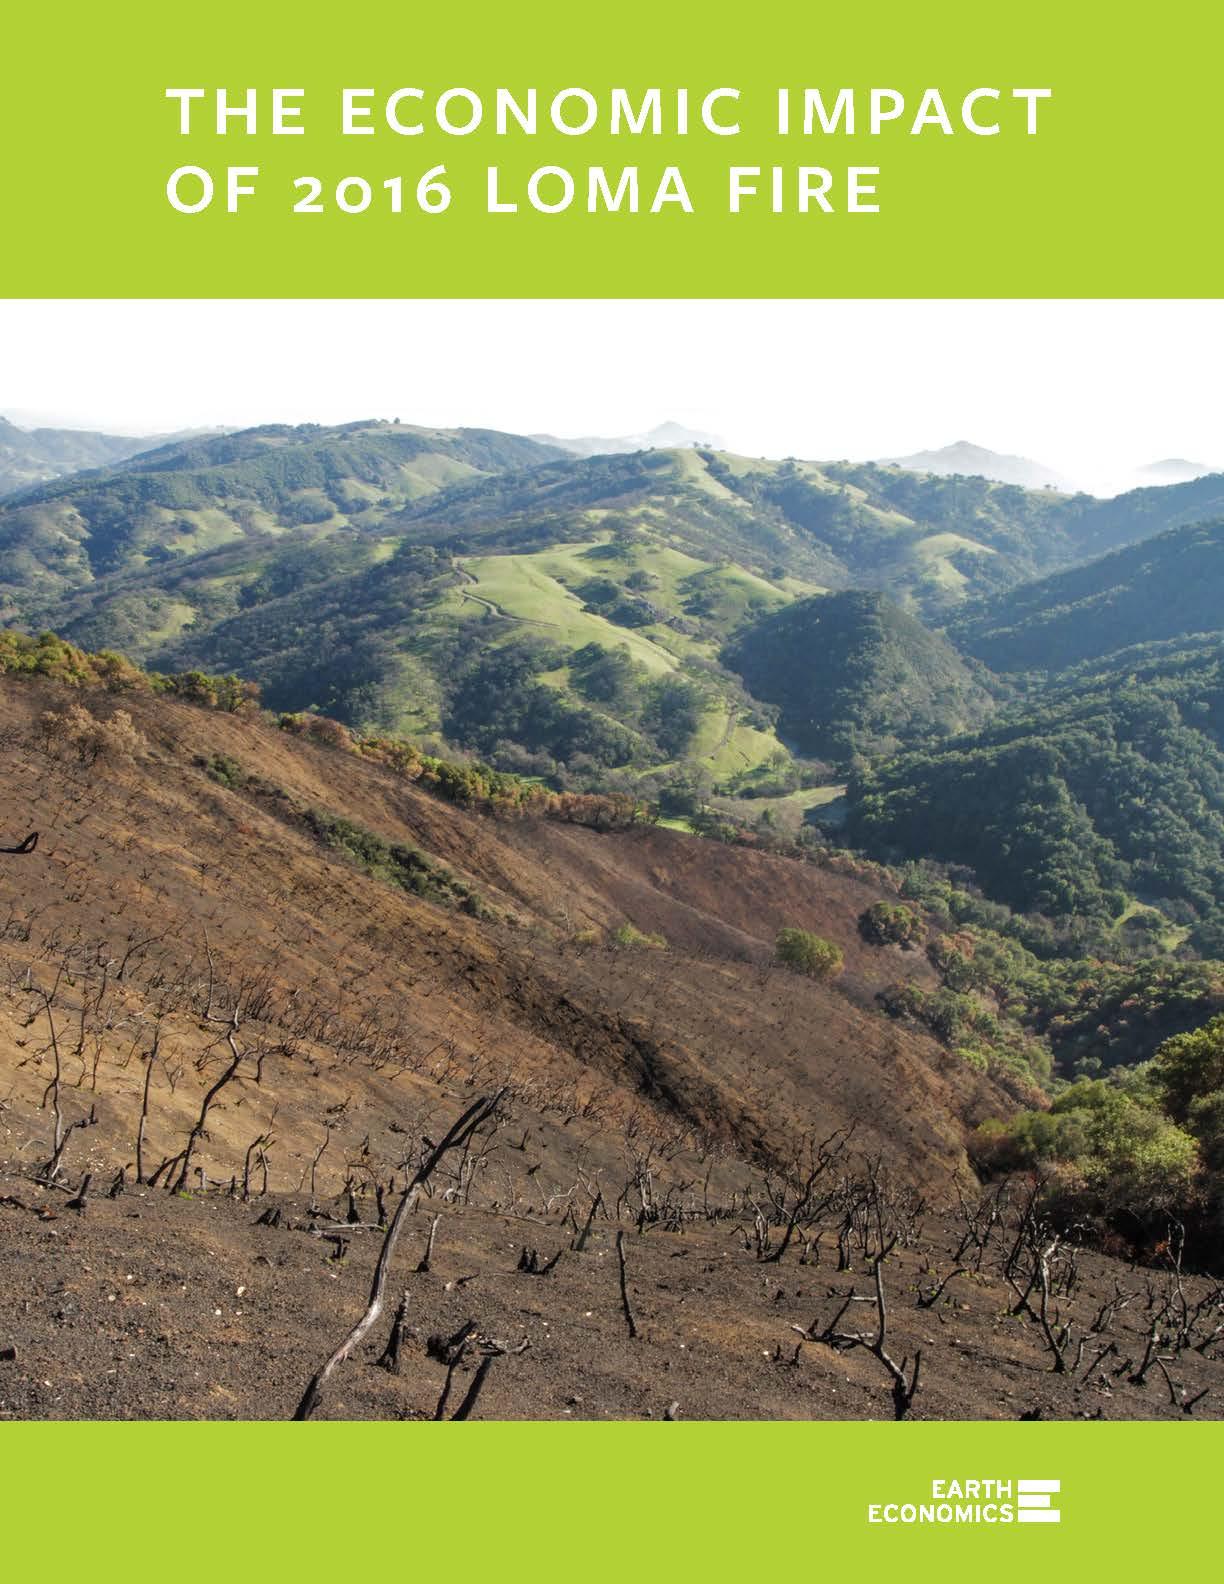 Cover_2016LomaFire_EarthEconomics_2017.jpg